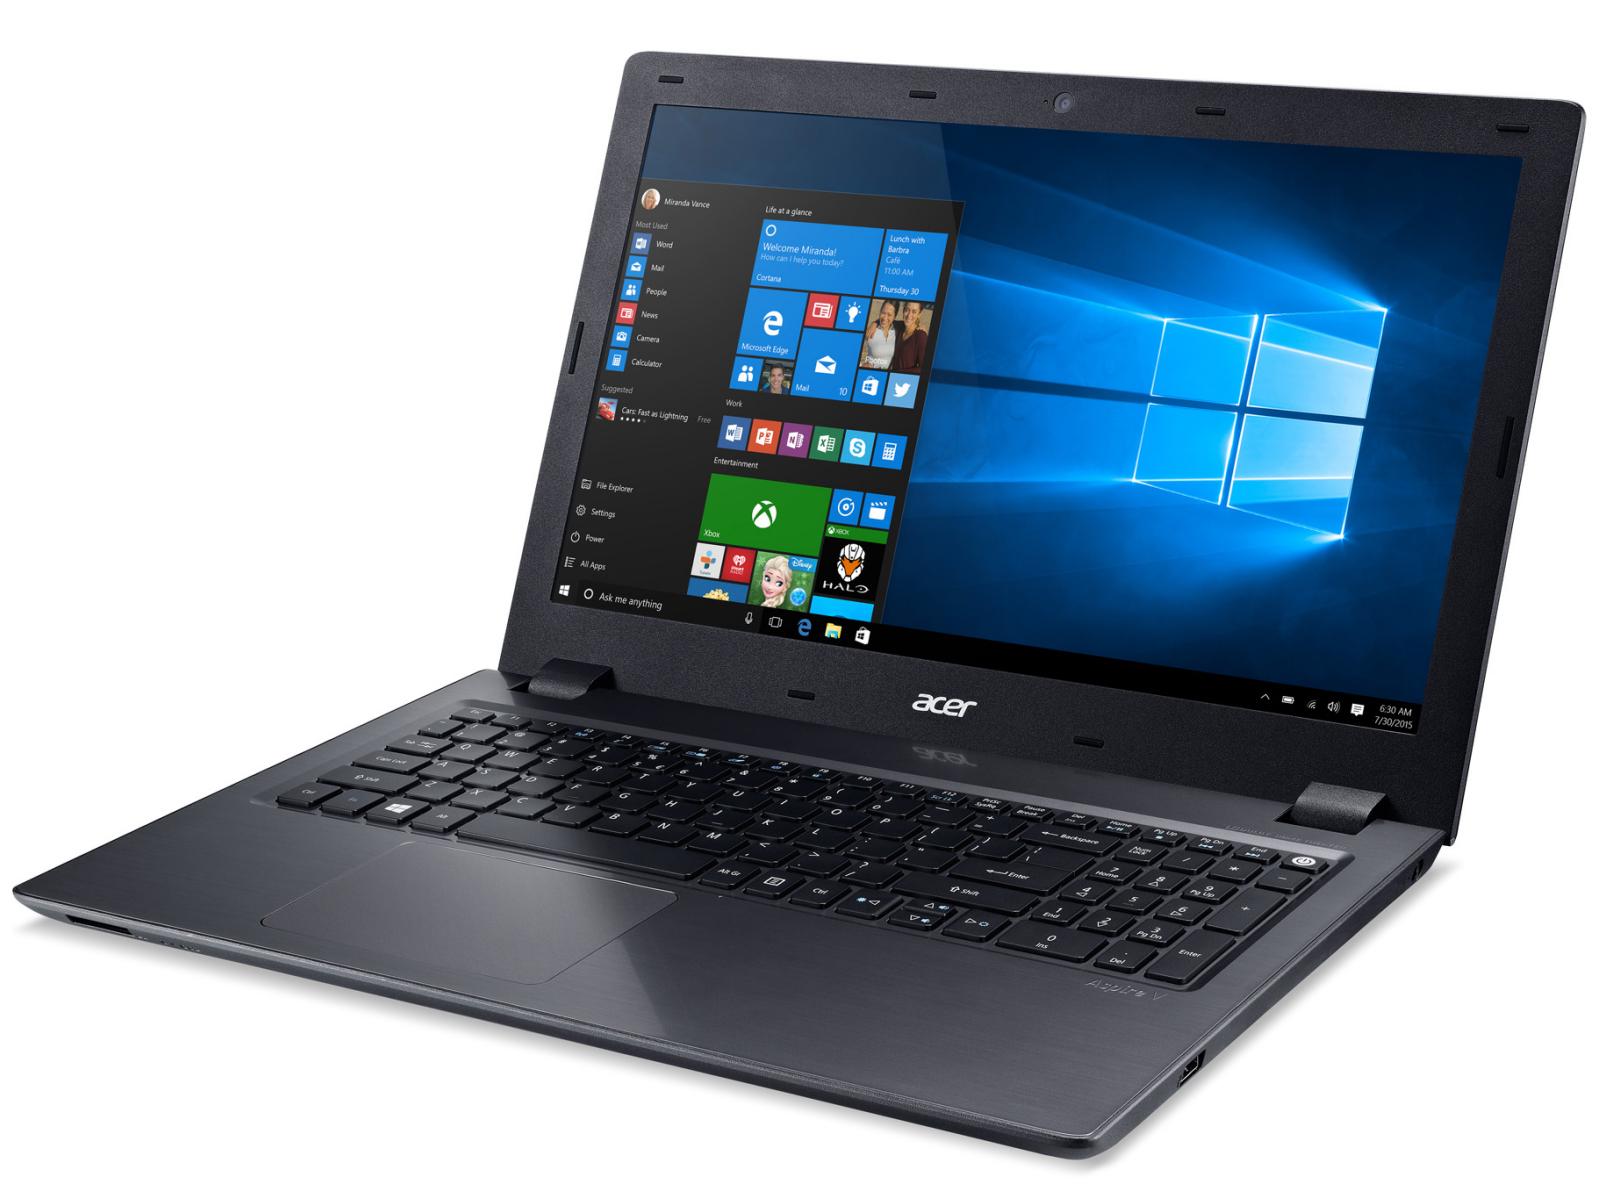 Acer Aspire V5 591g 71k2 Notebookcheck Net External Reviews